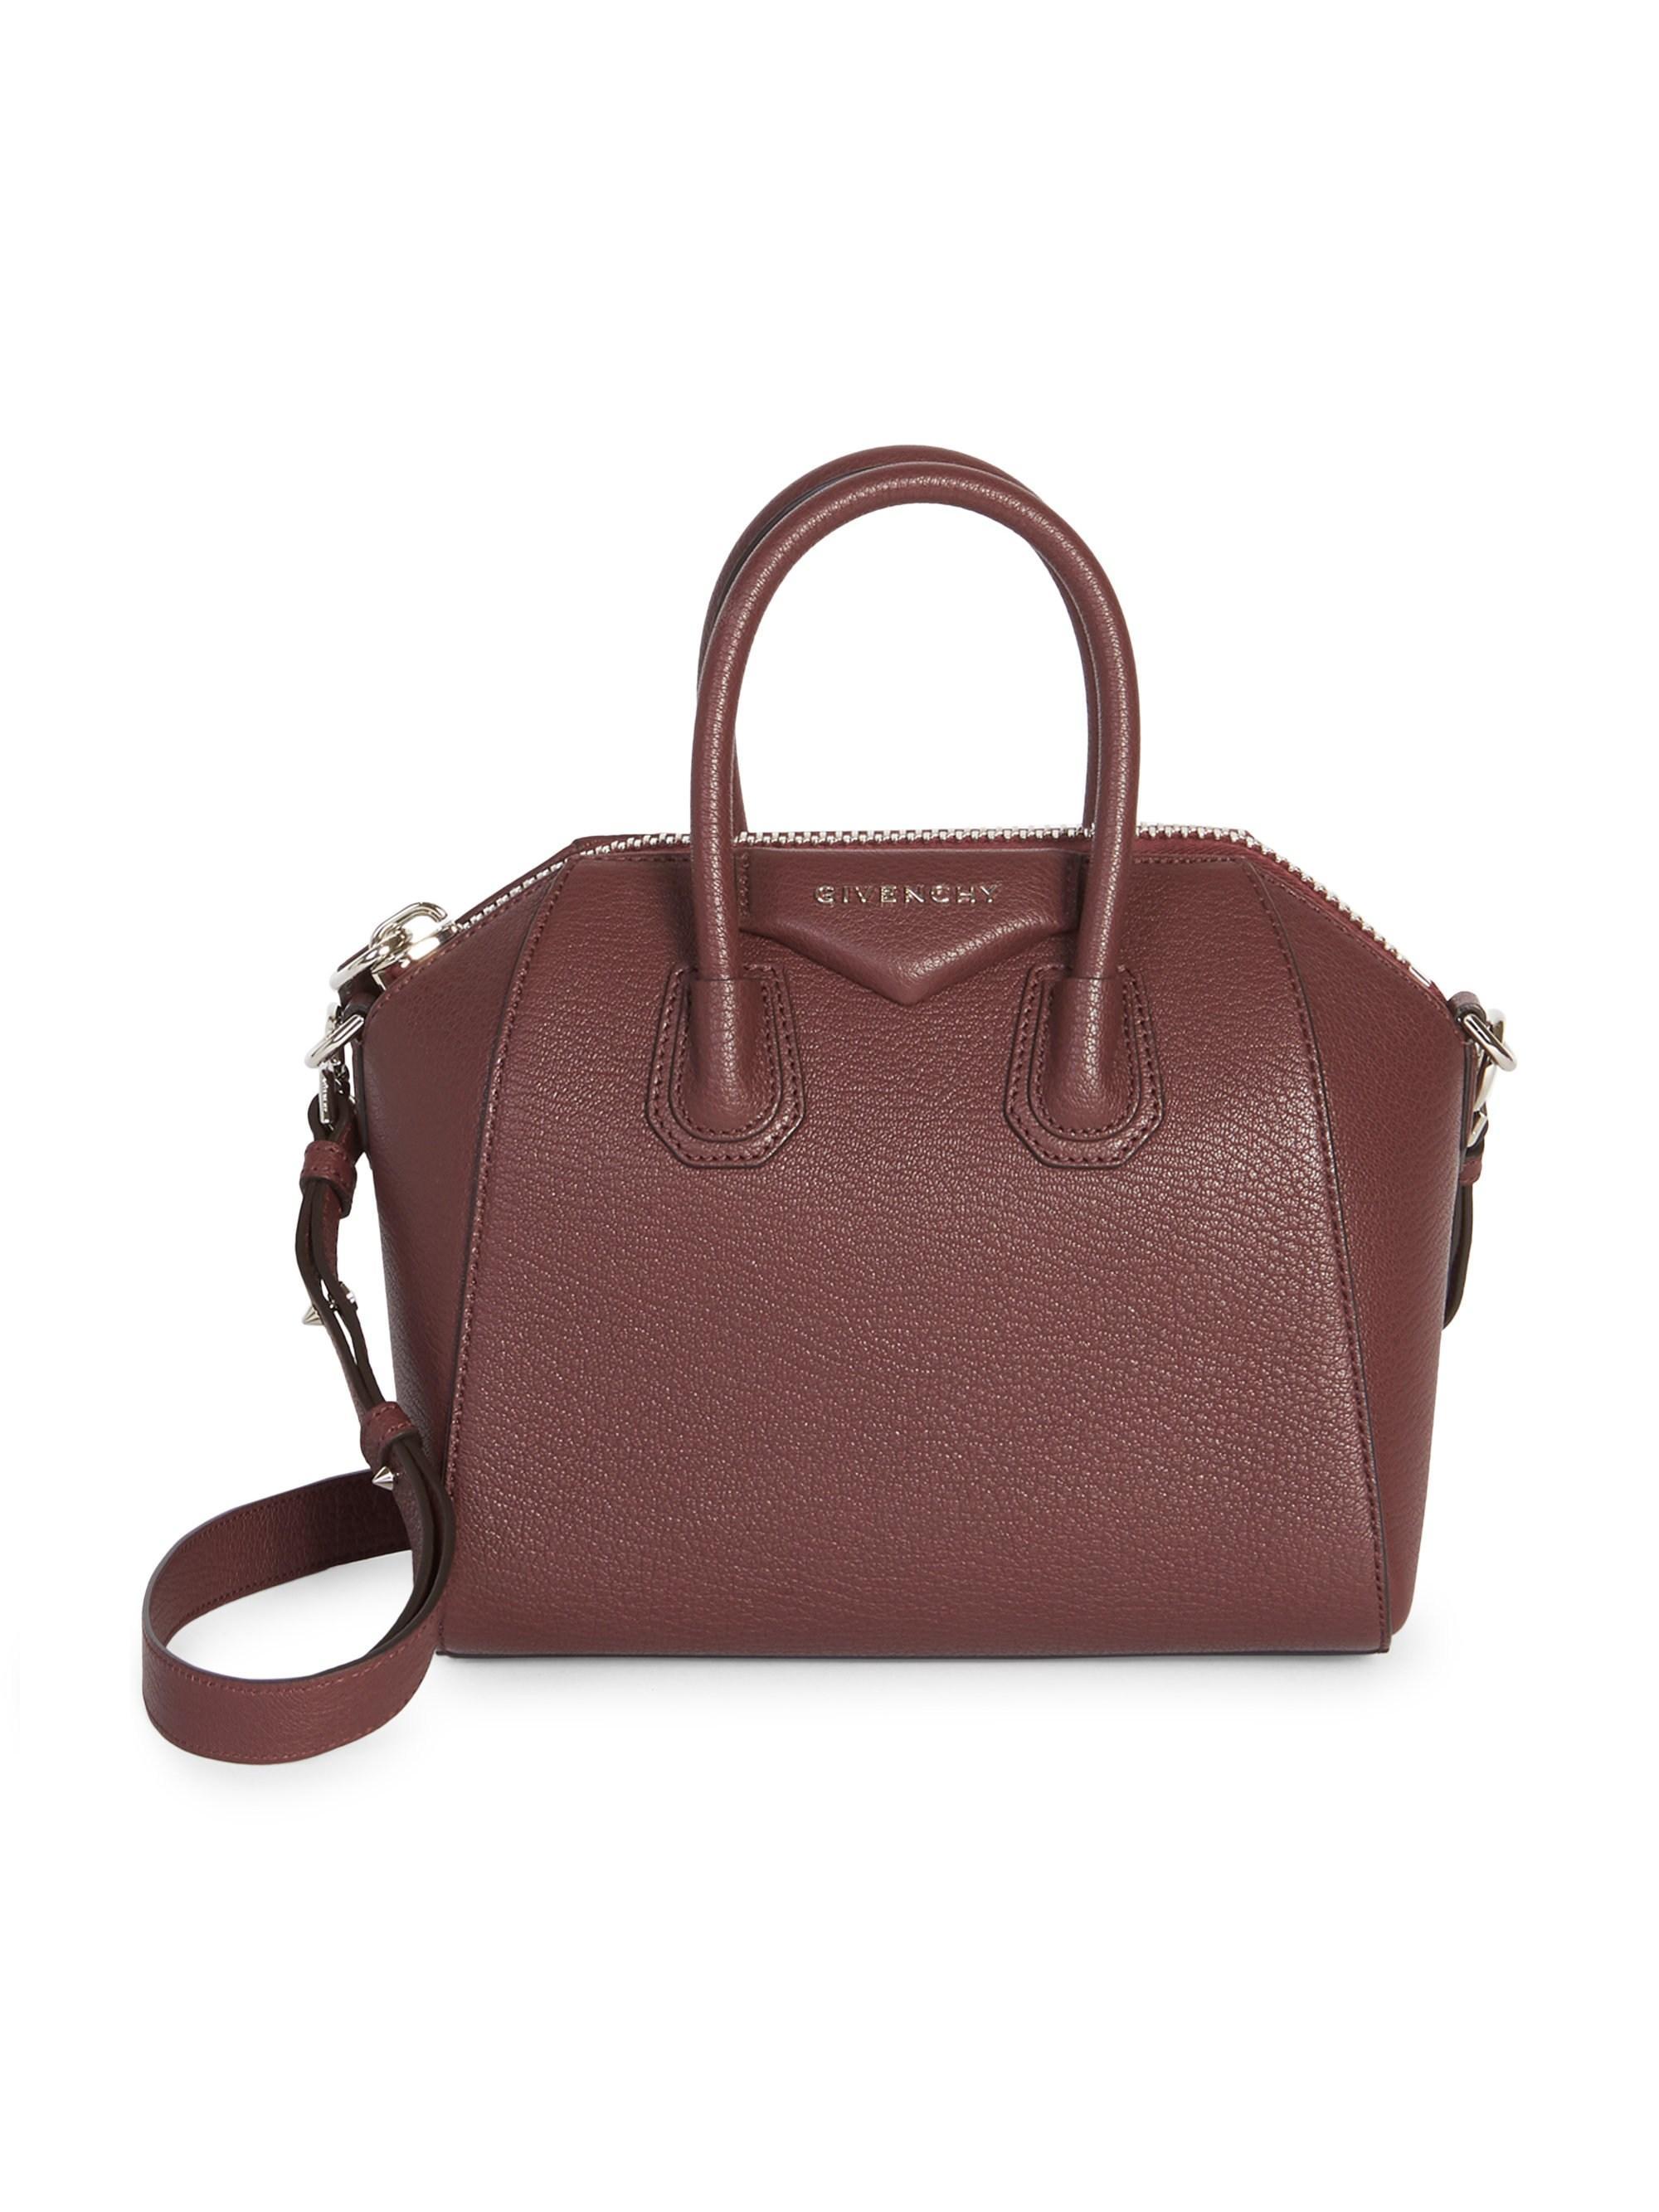 Lyst - Givenchy Antigona Mini Leather Satchel in Purple 9b71ecdec229a